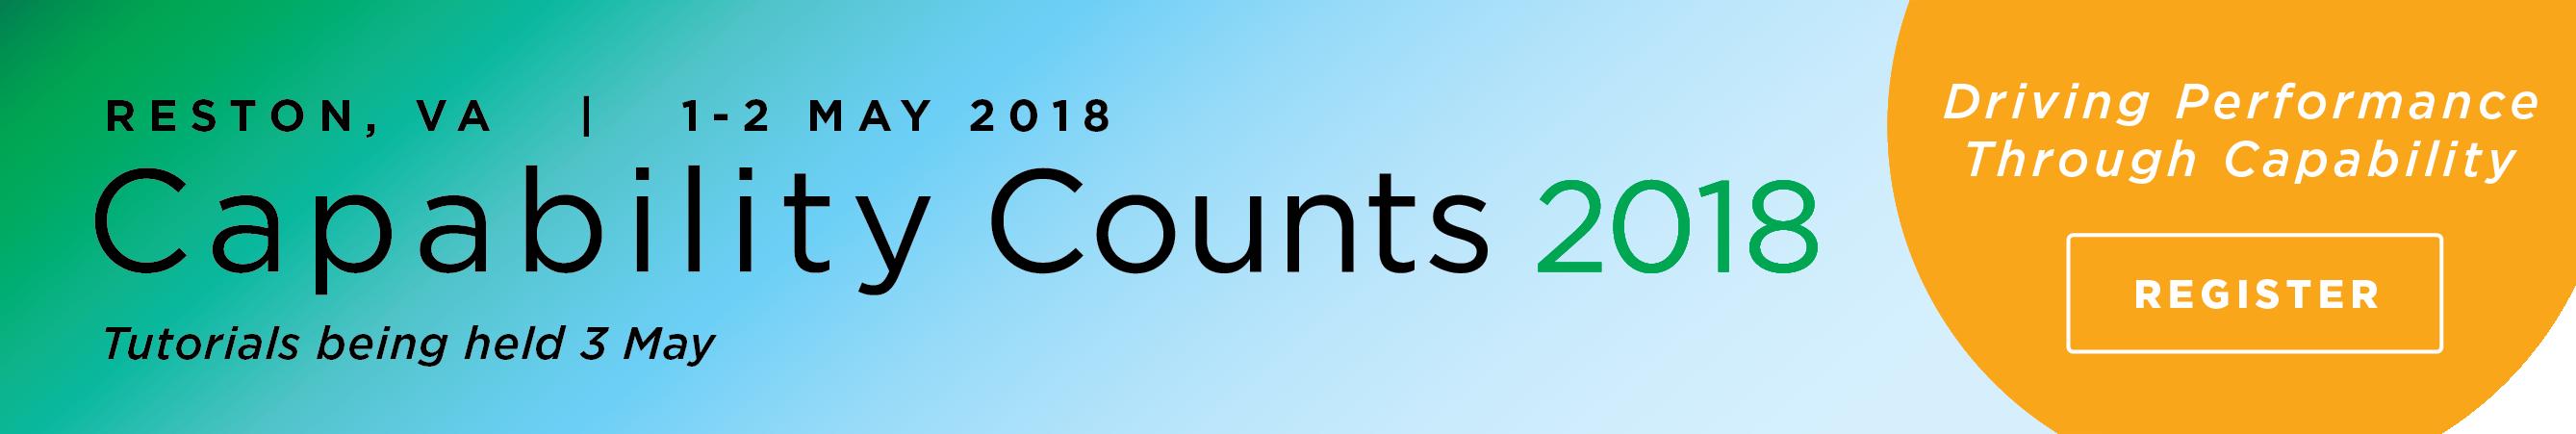 Capability Counts 2018